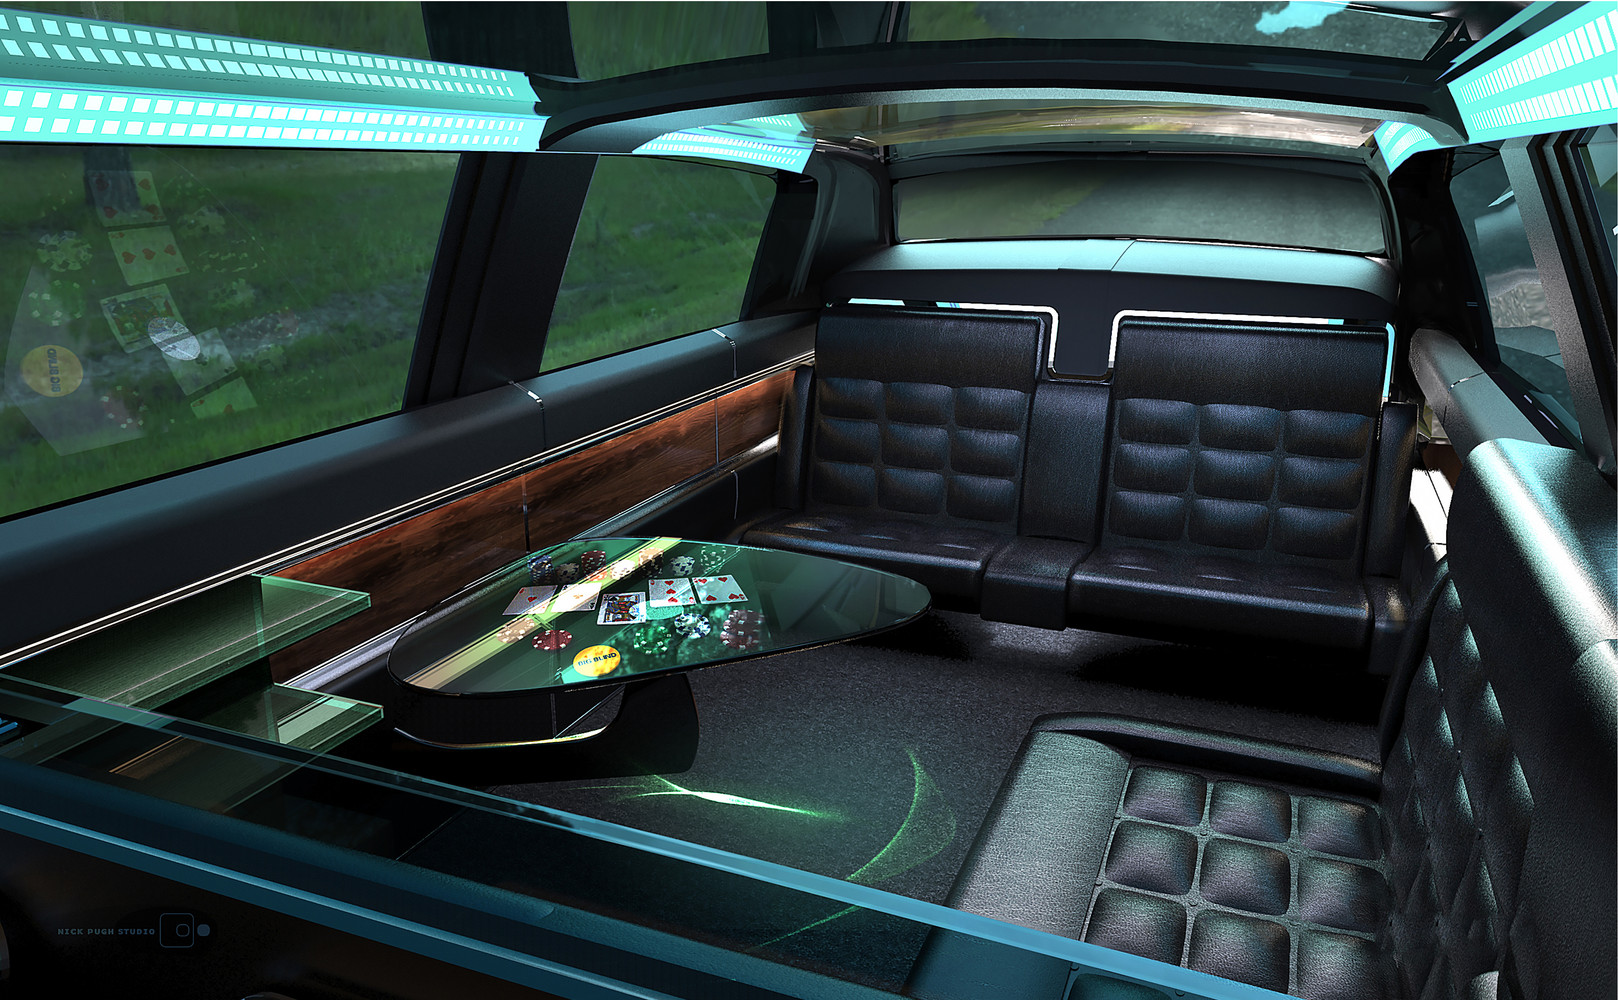 interiorLookingBack.jpg